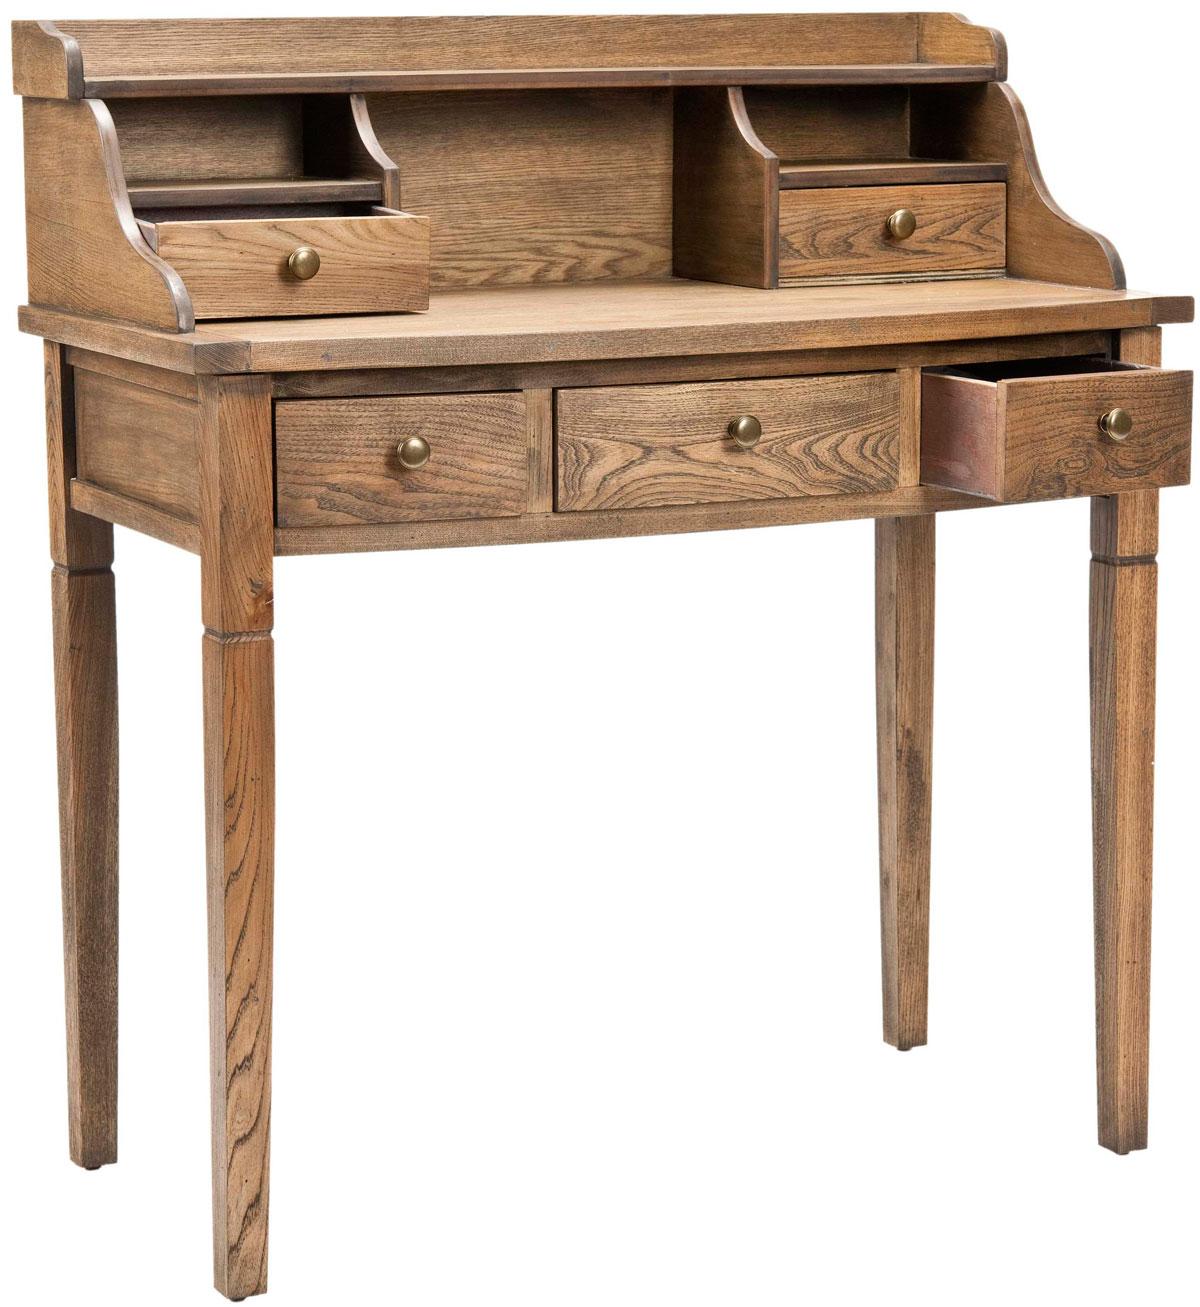 Amh6516a Desks Furniture By Safavieh